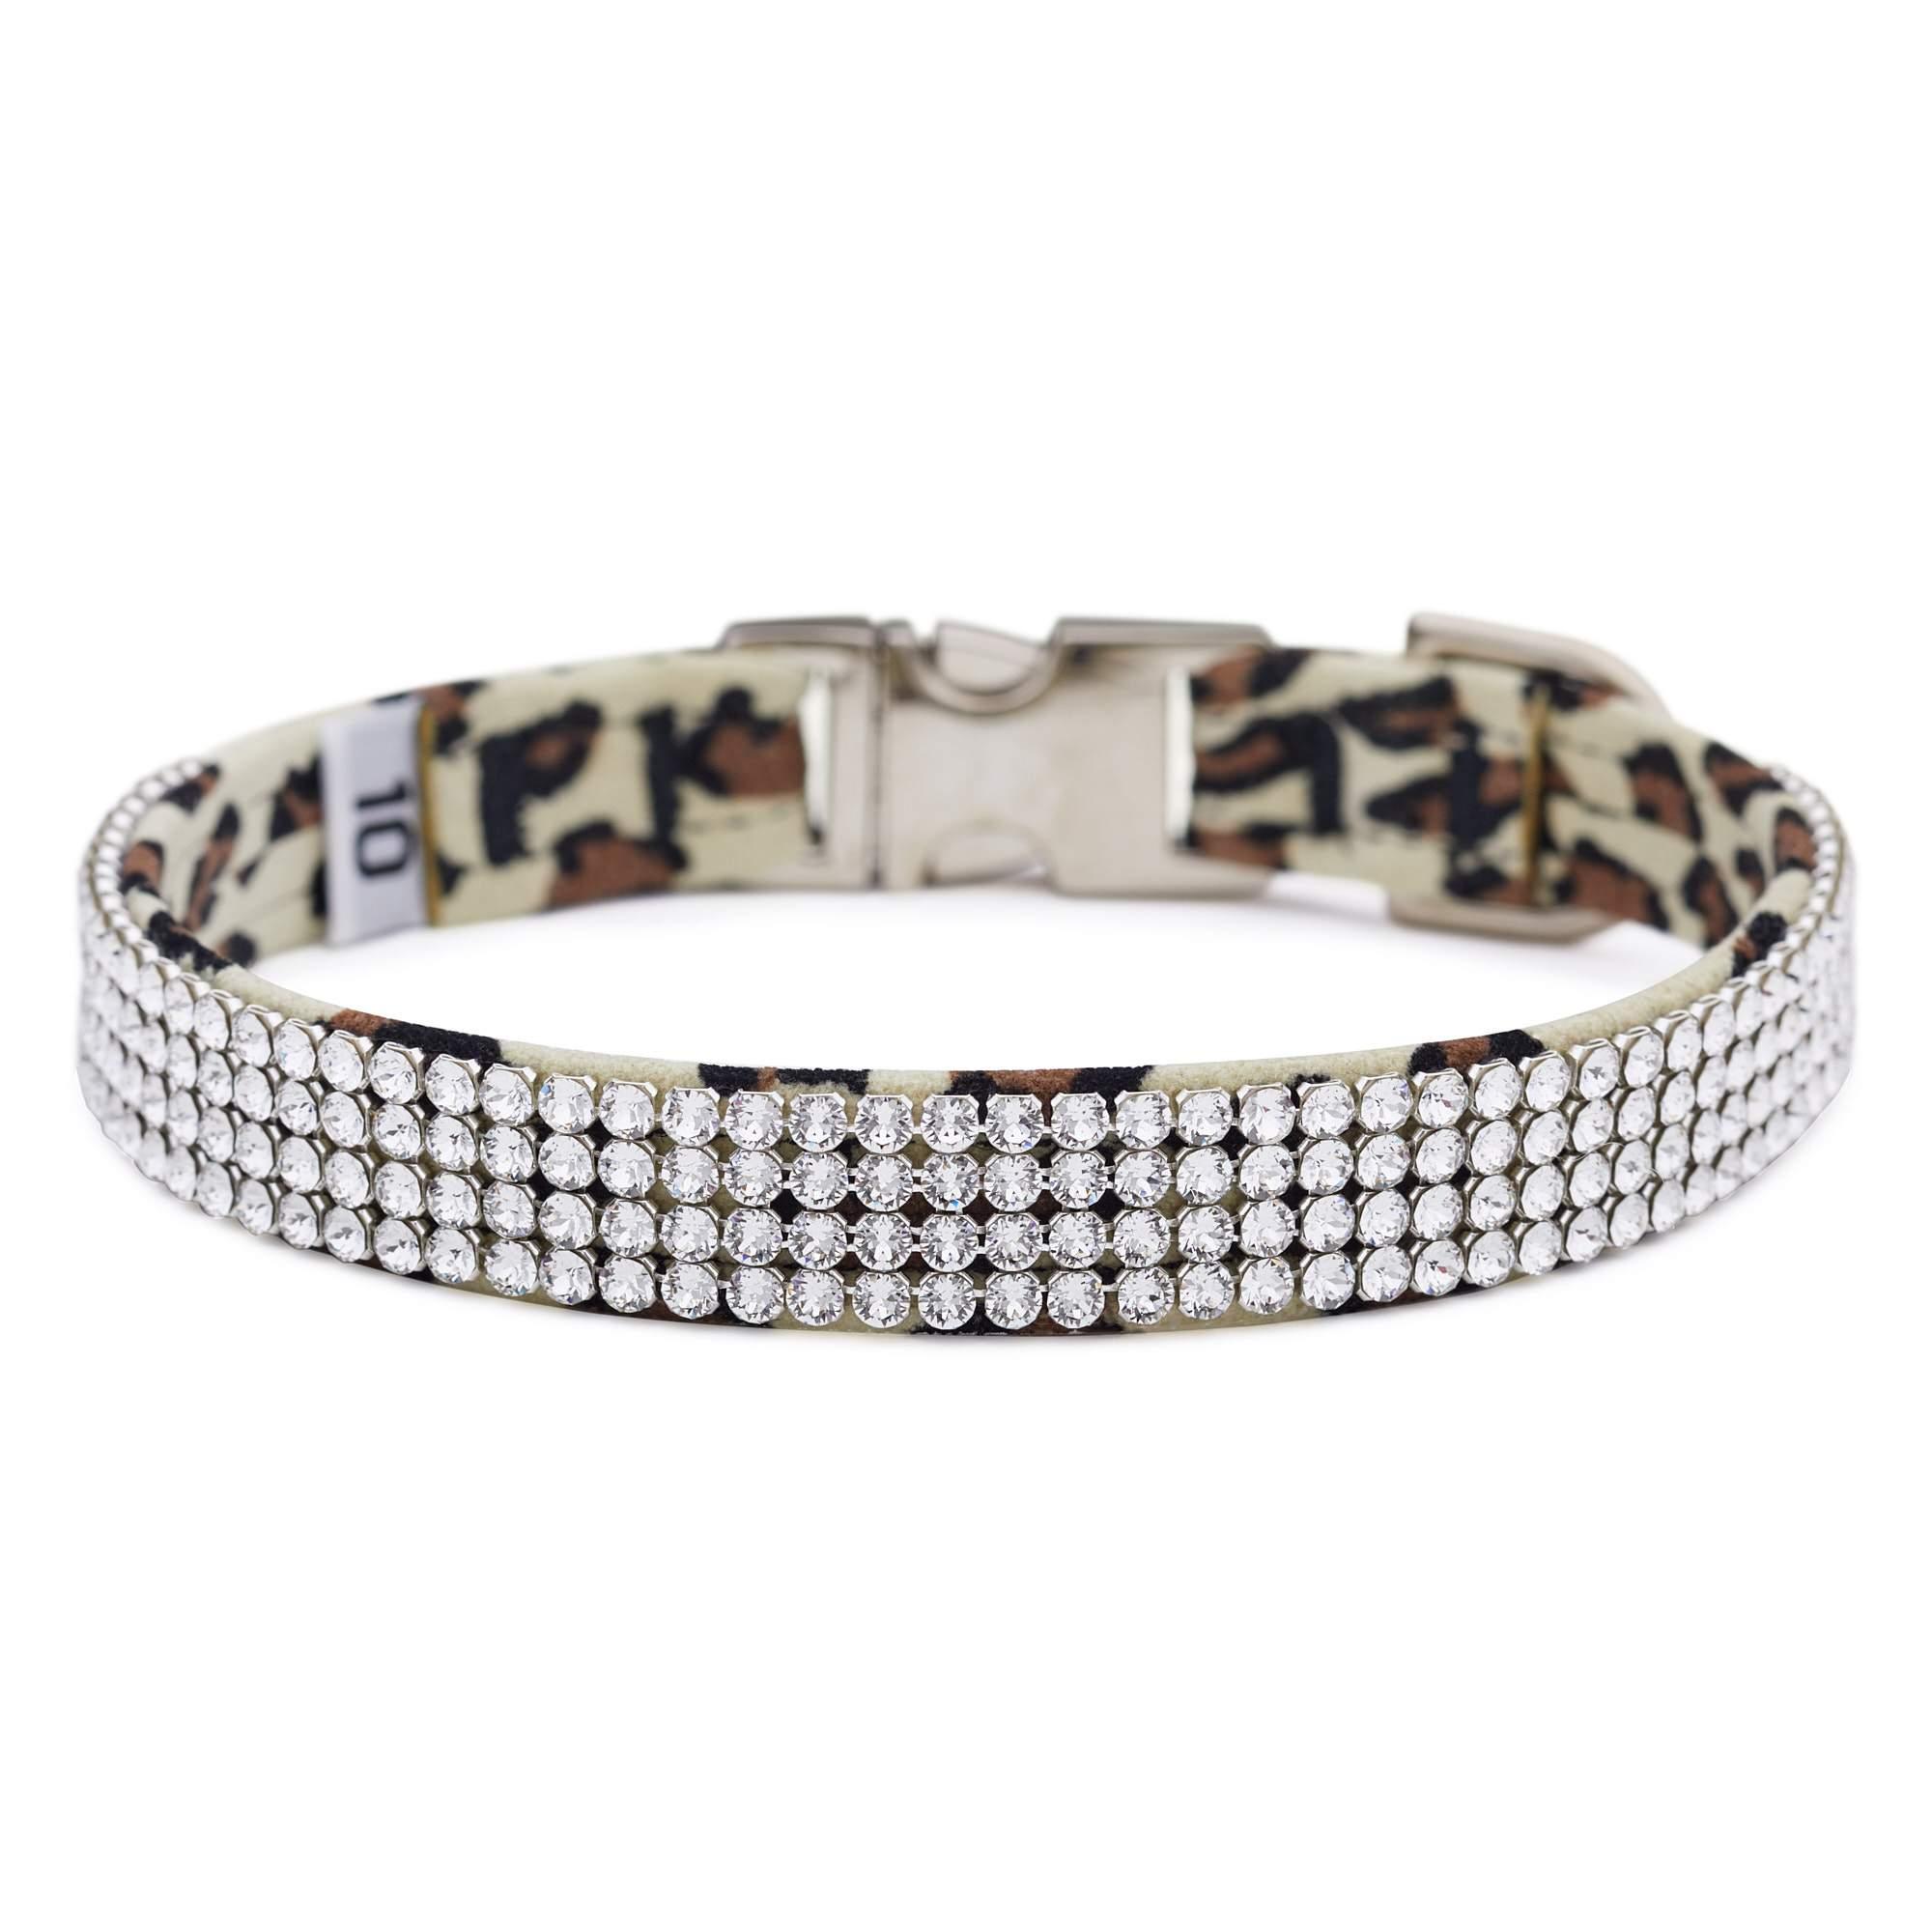 Cheetah Light 4 Row Giltmore Perfect Fit Collar